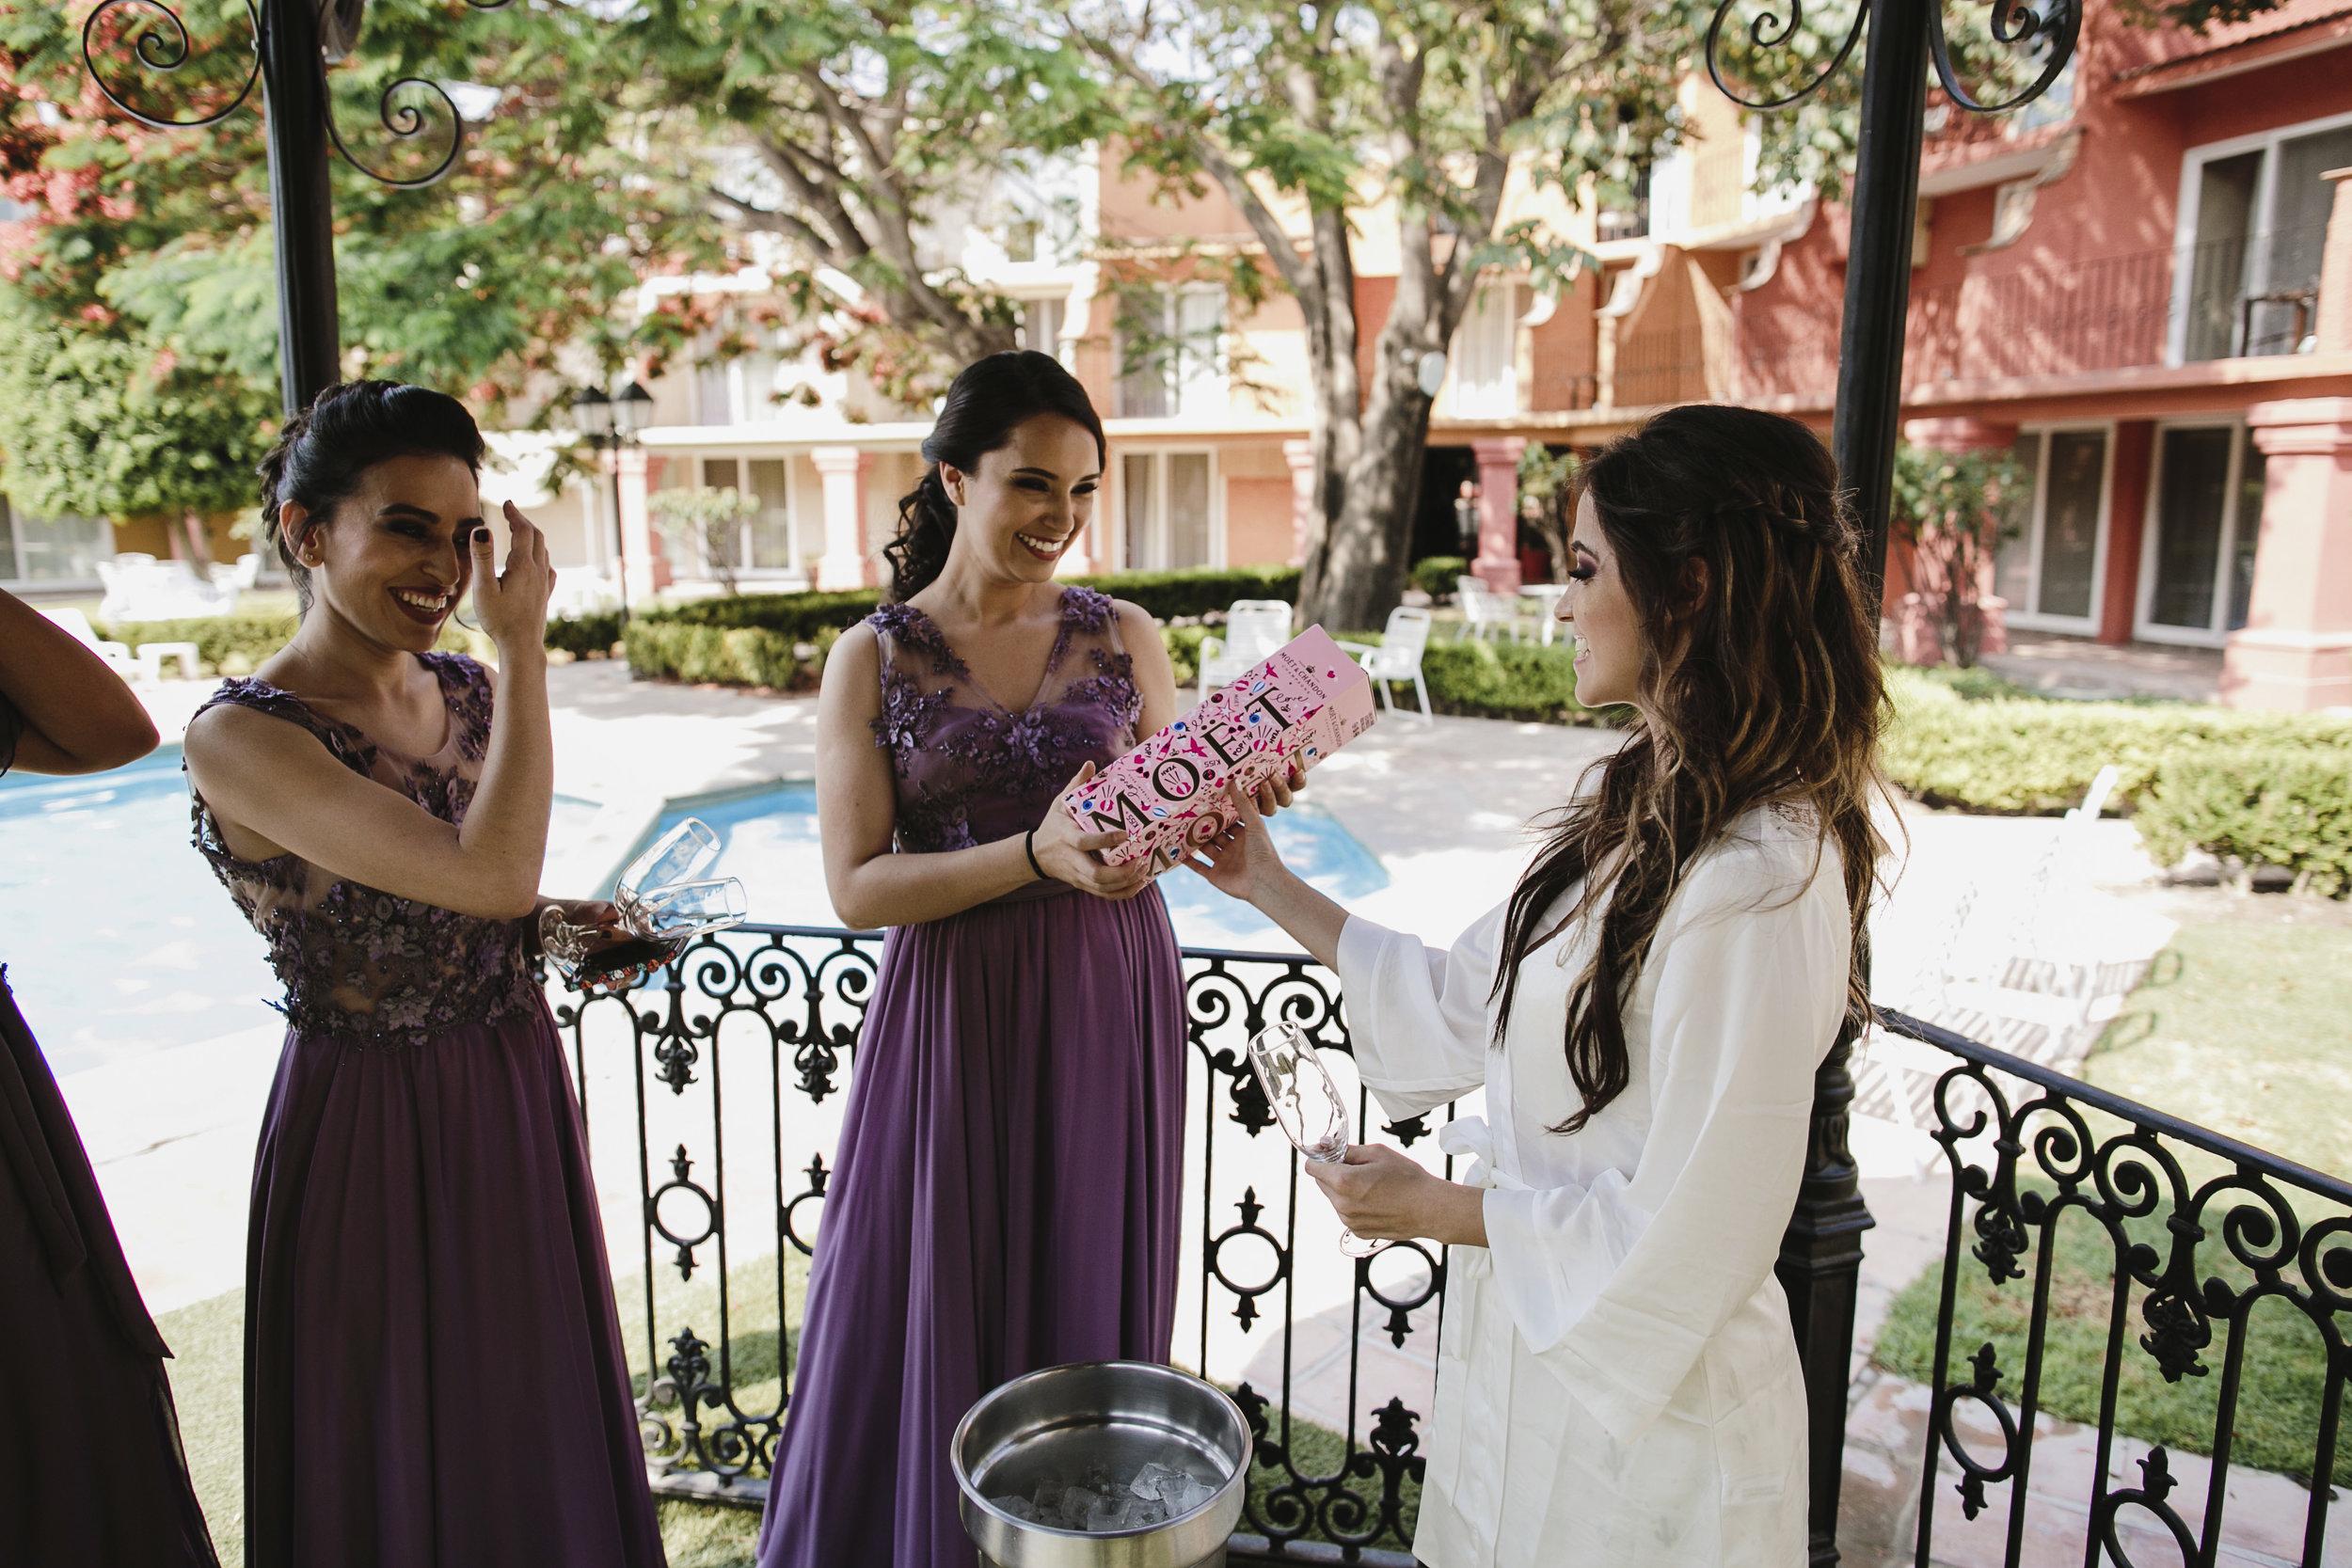 alfons_flores_destination_wedding_photography_mavi_david-559.JPG